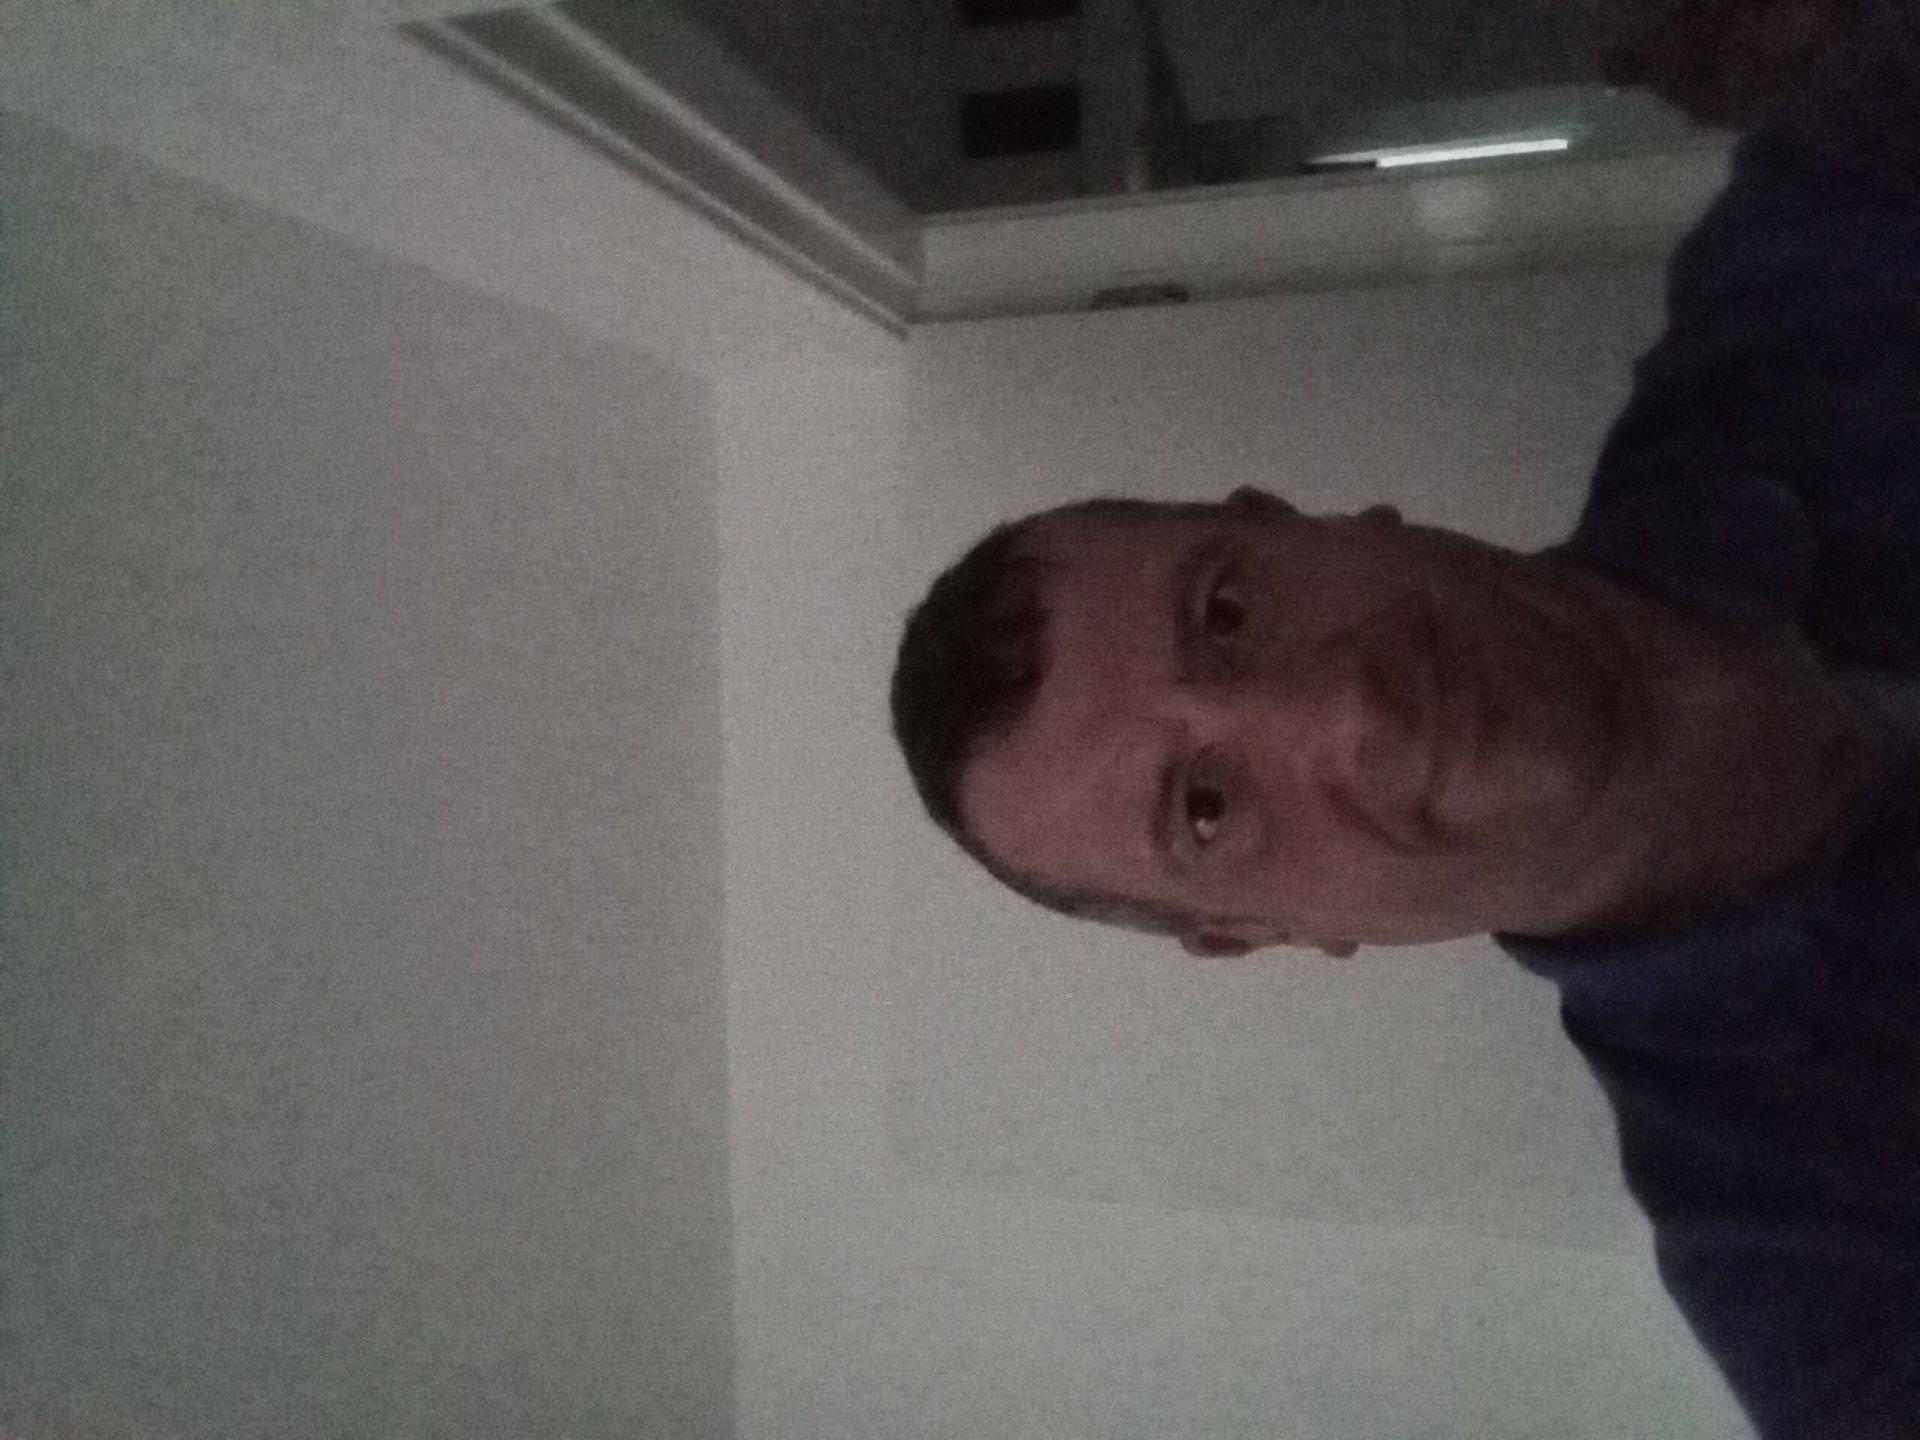 Davy47 from East Ayrshire,United Kingdom